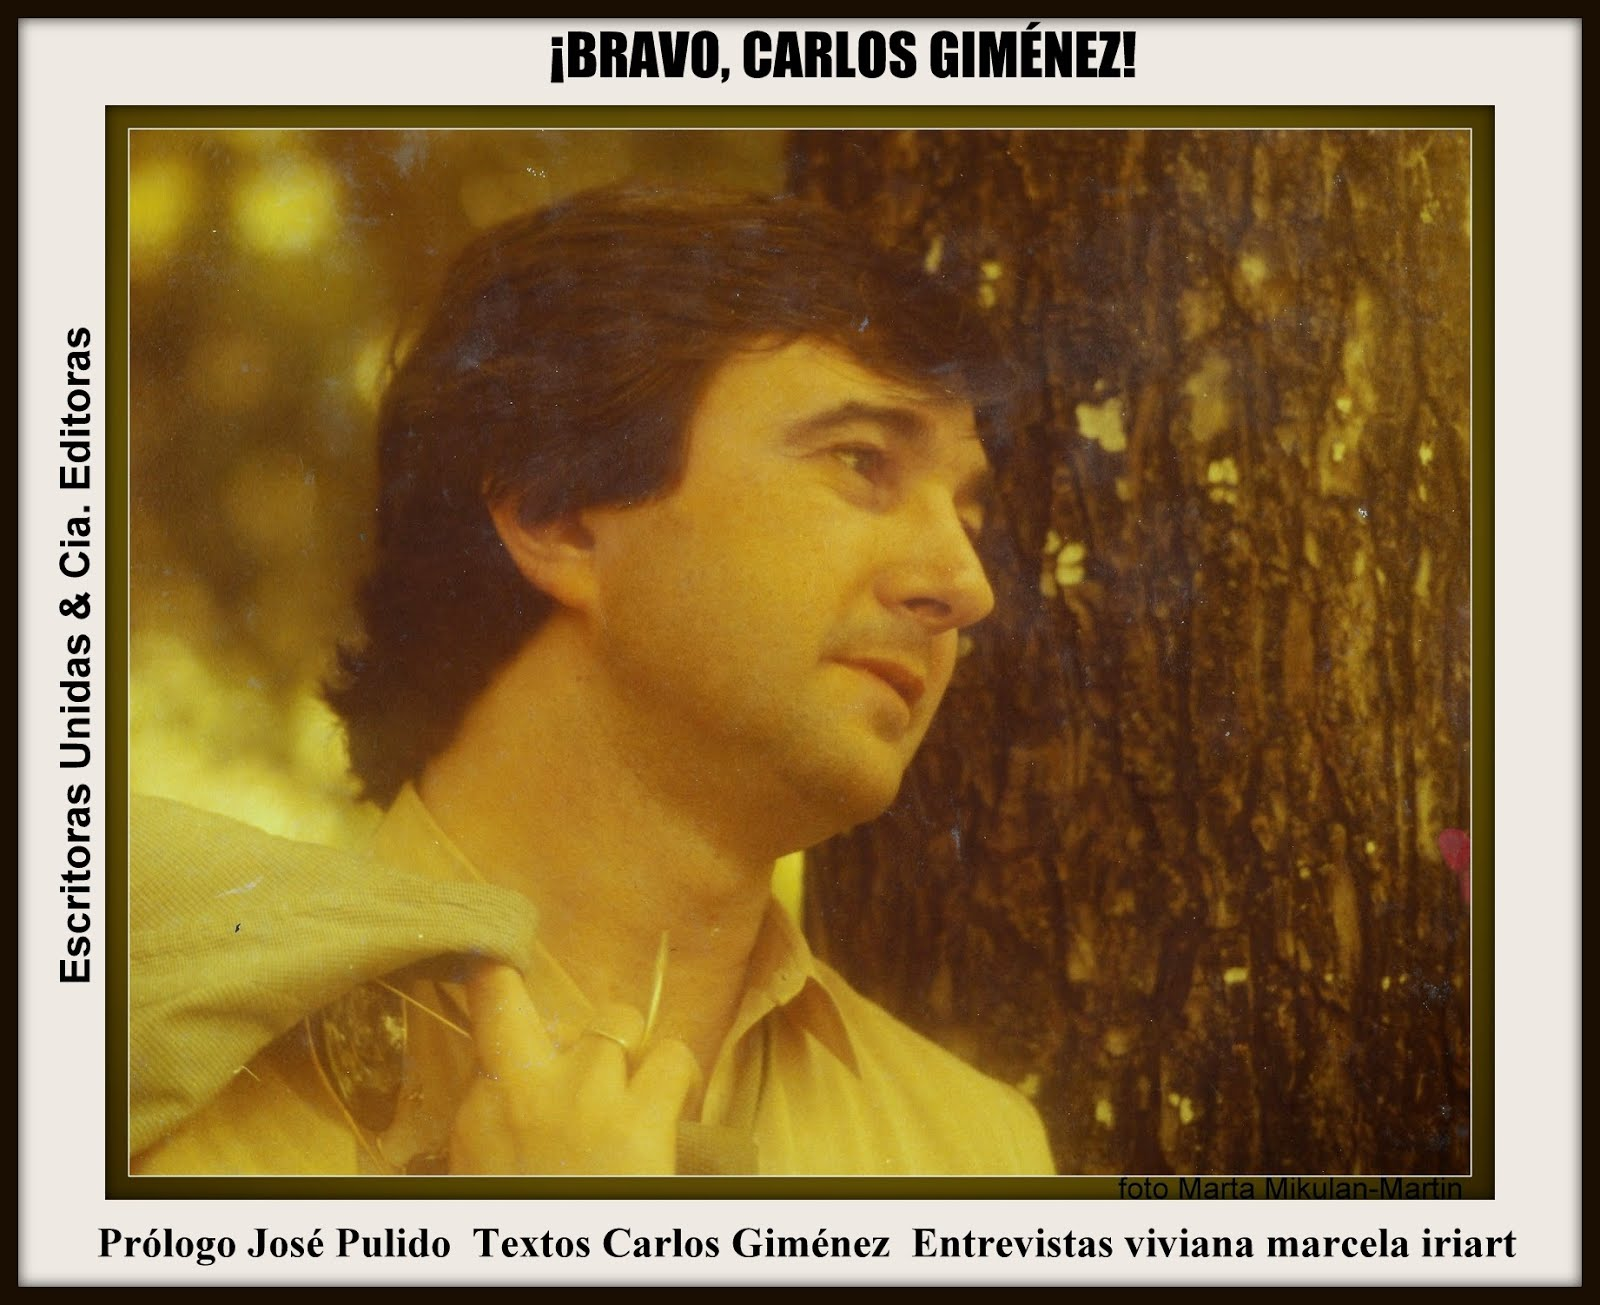 ¡BRAVO, CARLOS GIMÉNEZ!